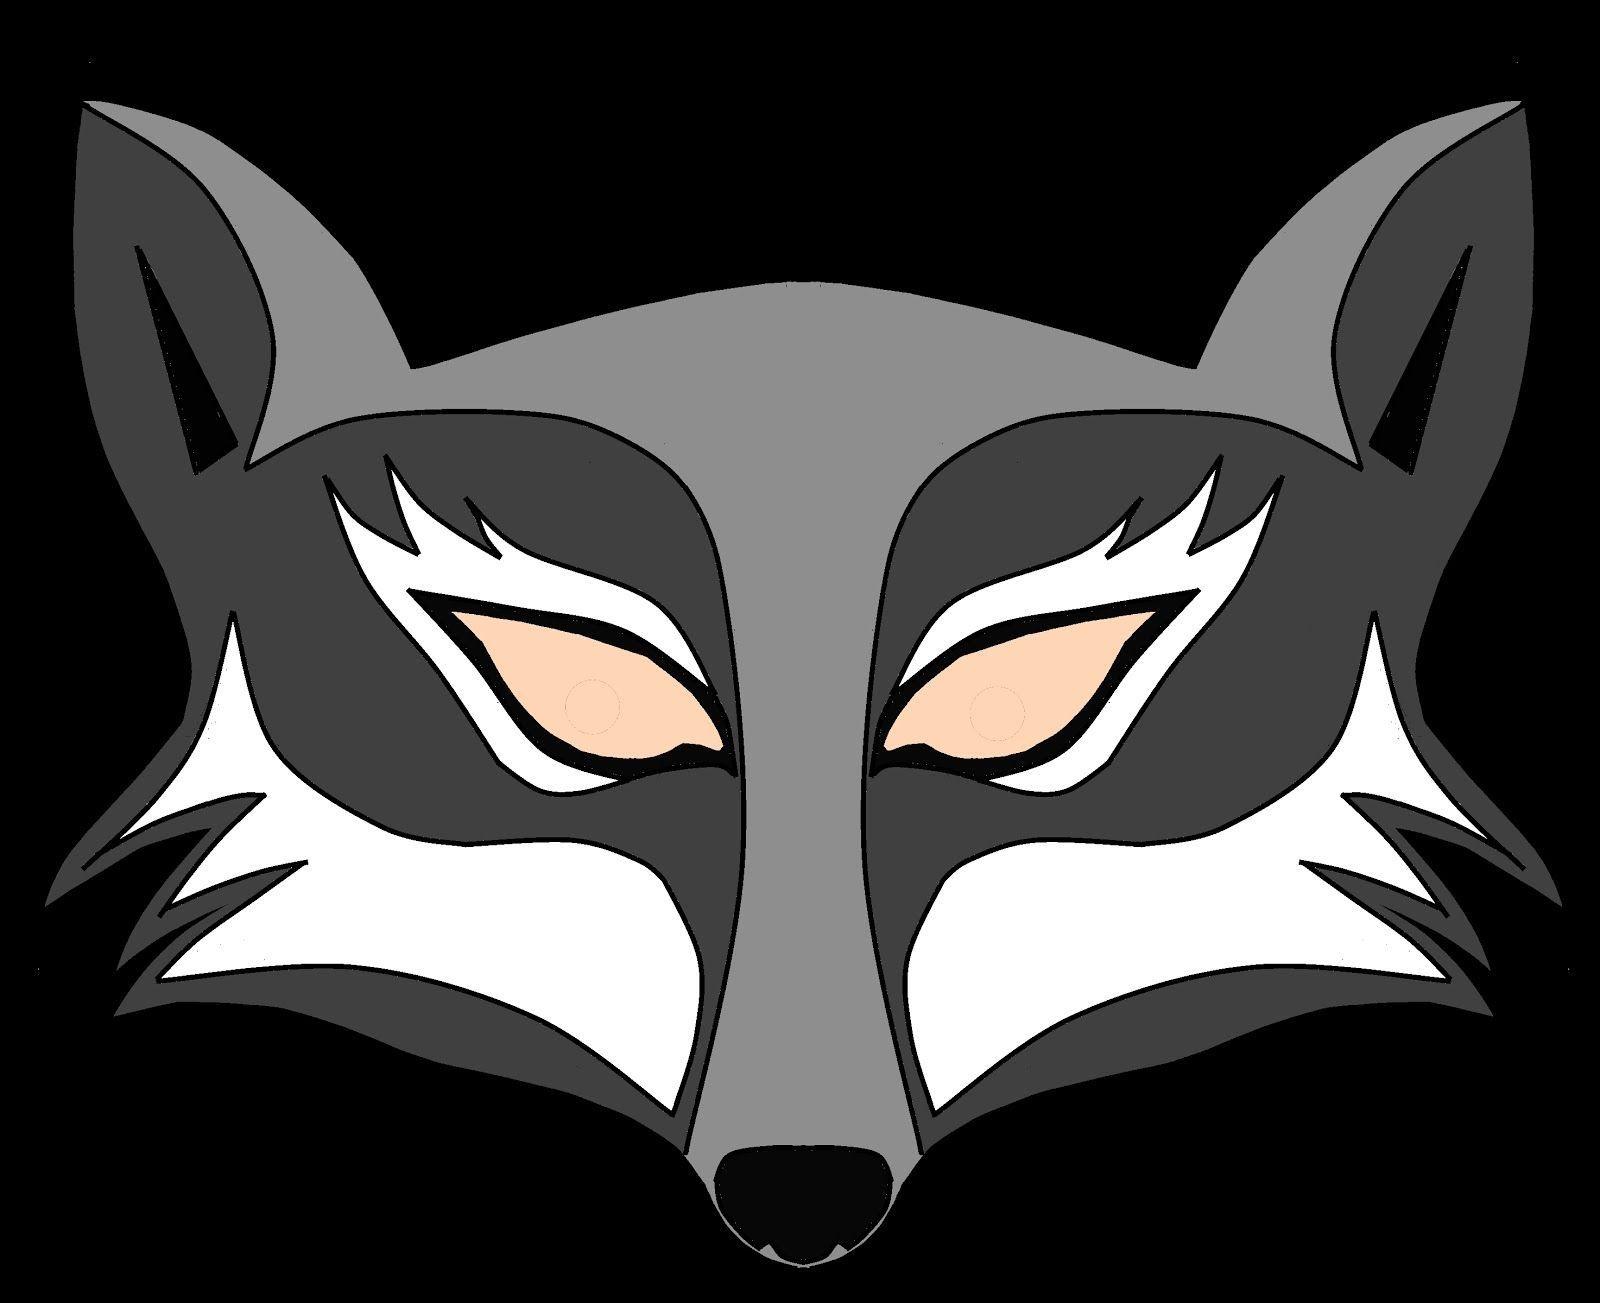 Wolf Mask Template Printable. Mask On Pinterest Leather Mask Mens - Free Printable Wolf Mask